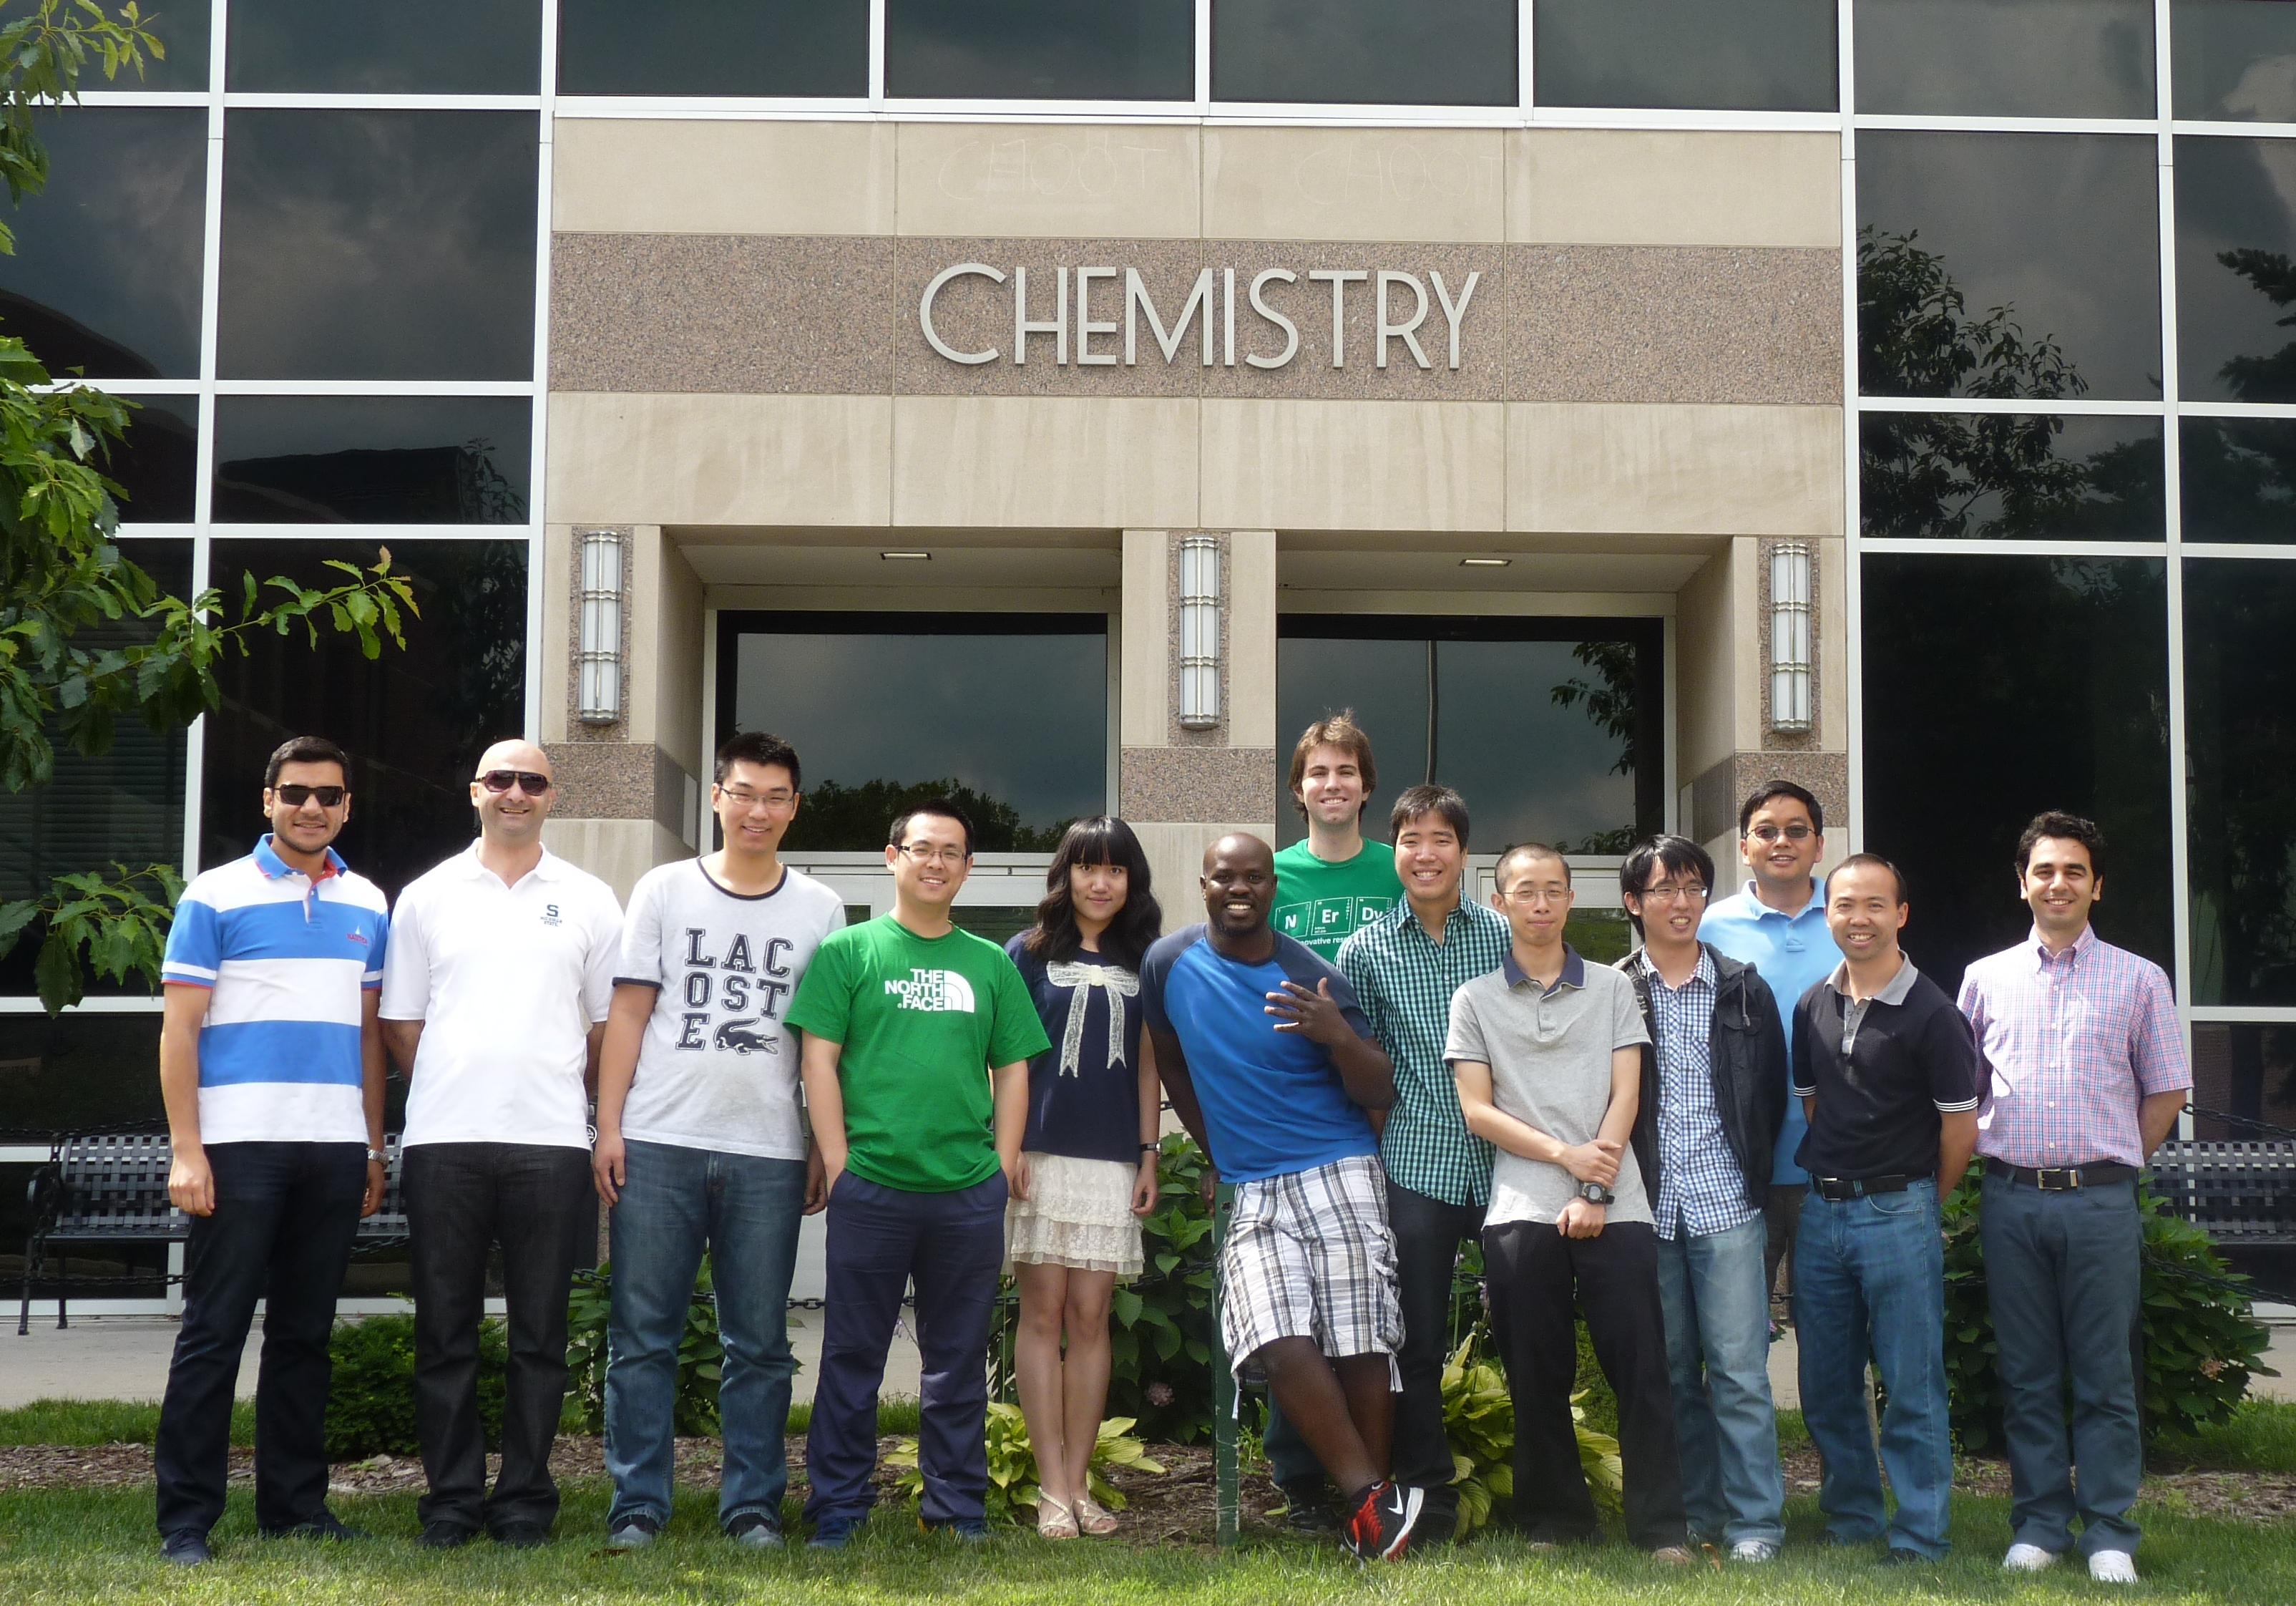 Chemistry Building Michigan State University